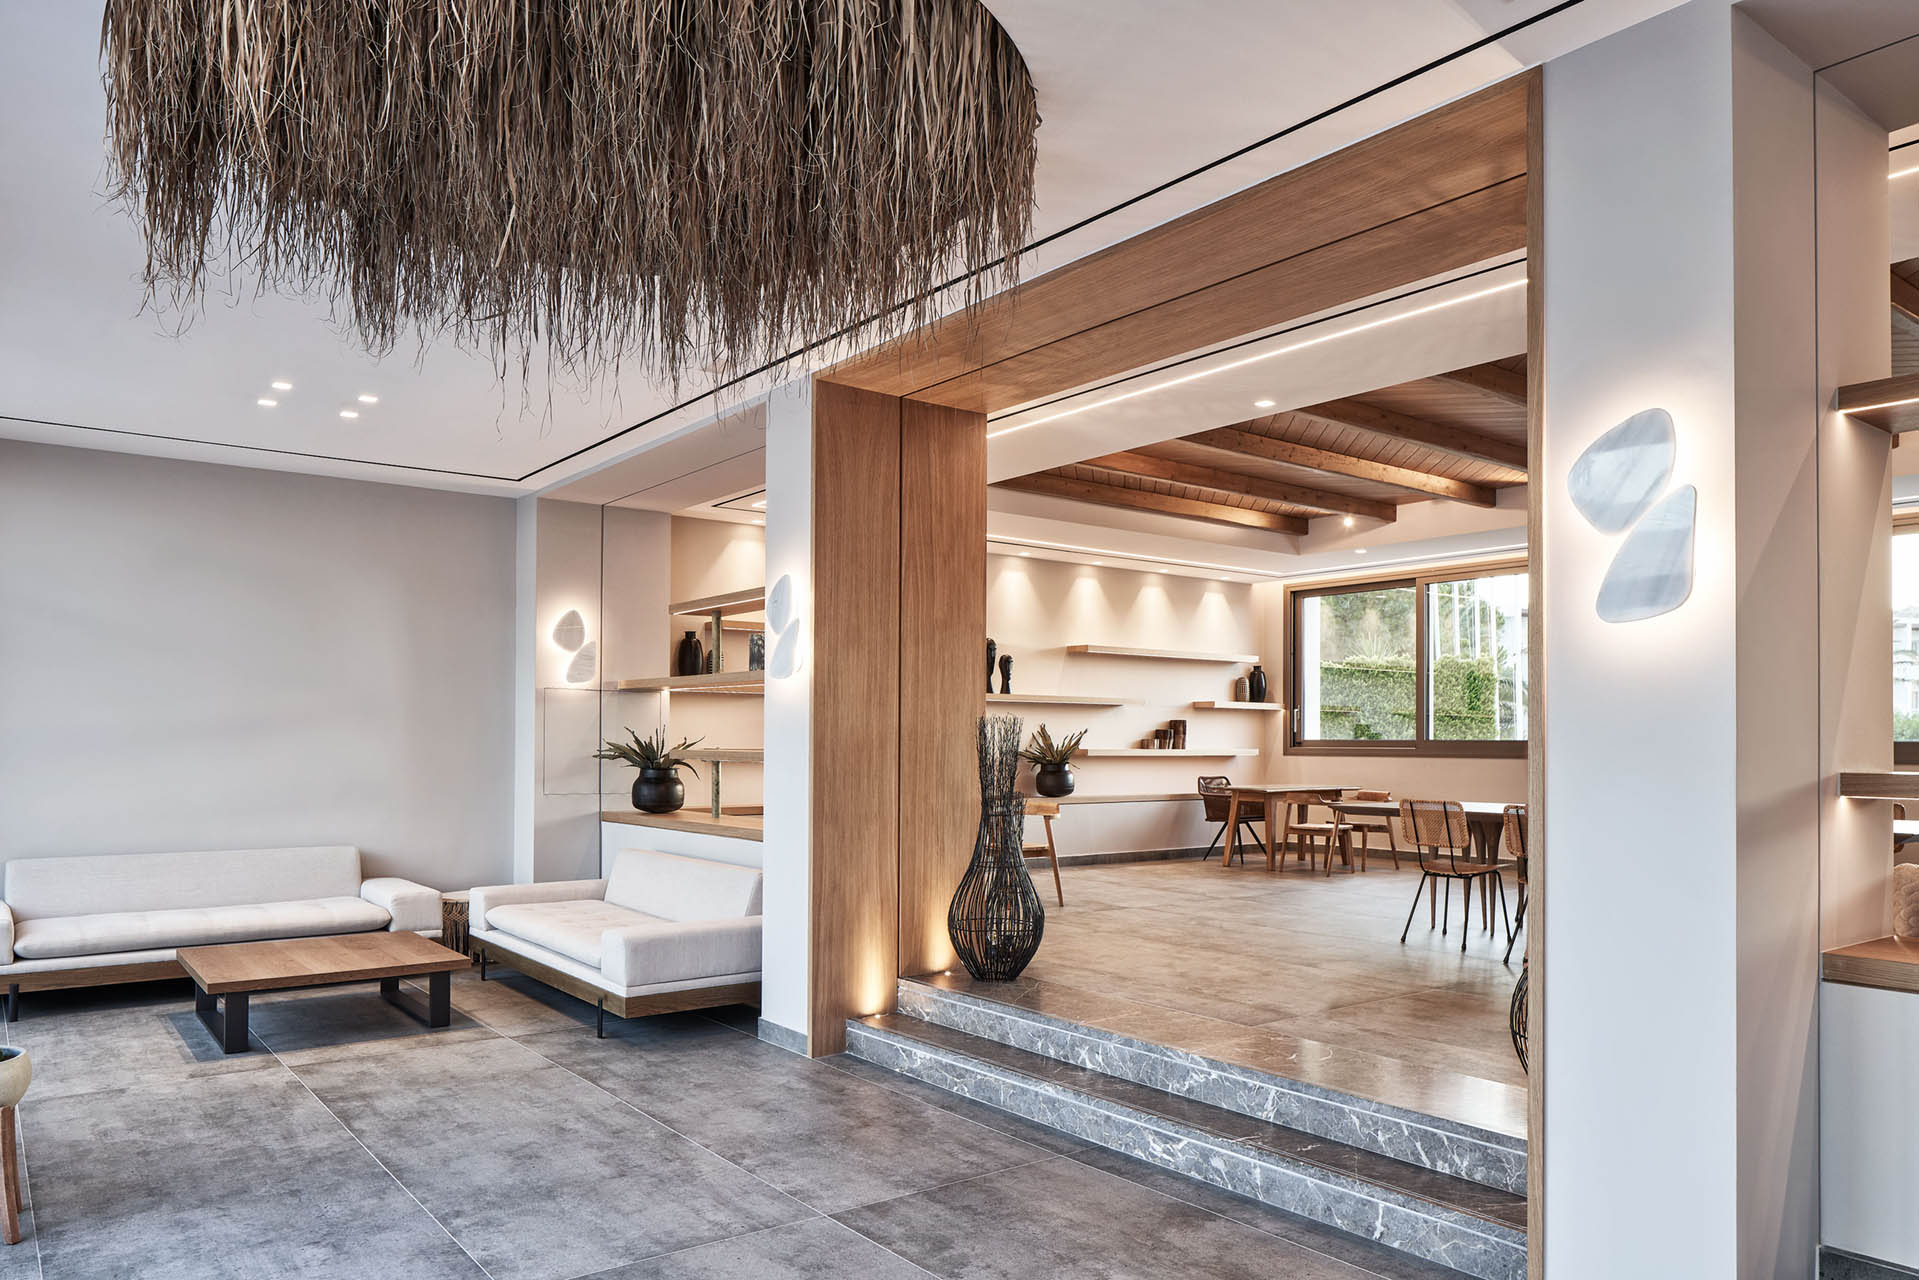 drz_atlantica-hotels-kos_27031